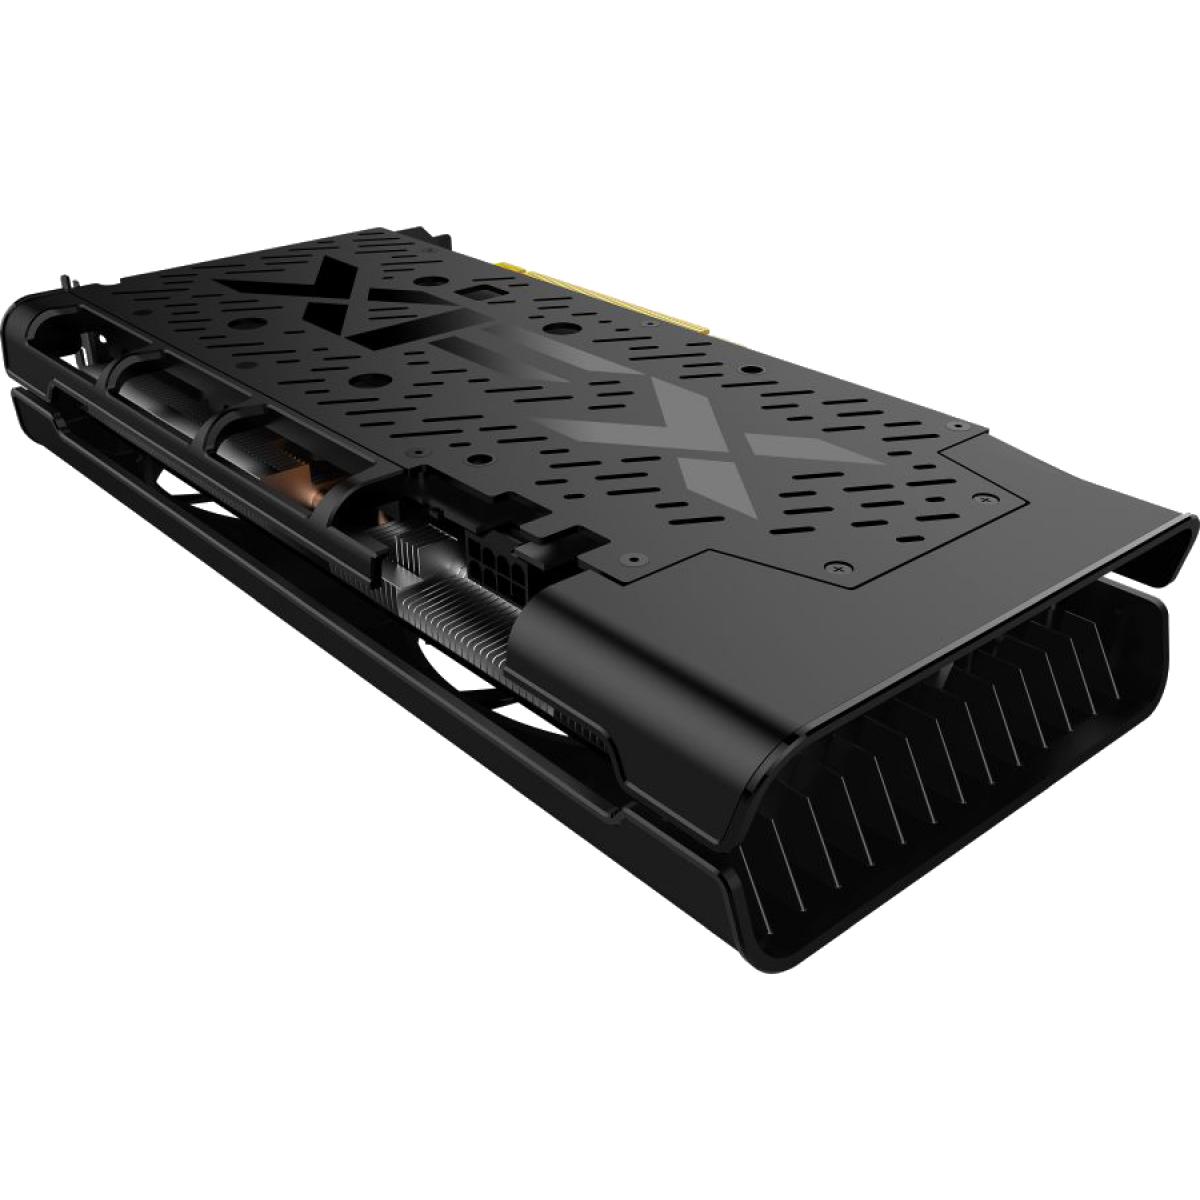 Placa de Vídeo XFX Radeon RX 5600 XT THICC II Pro, 6GB GDDR6, 6GB GDDR6, 192Bit, RX-56XT6DFD6